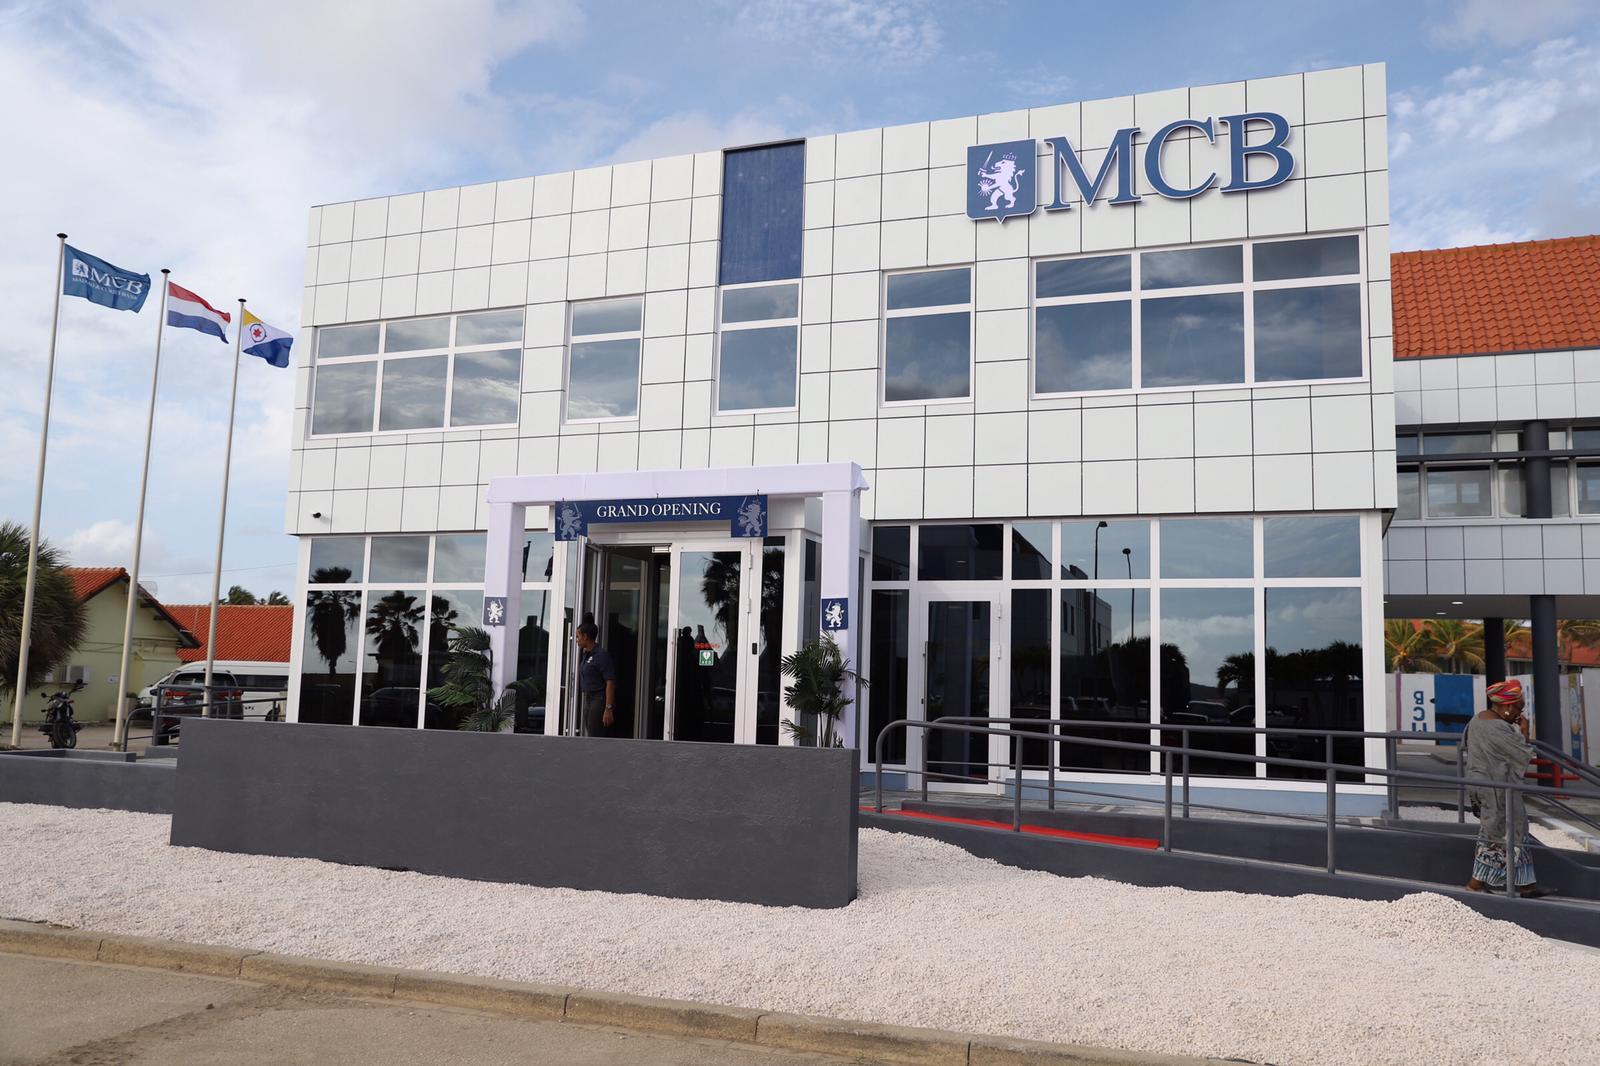 MADURO & CURIEL'S BANK (BONAIRE) N.V. KU MEDIDANAN DI EMERGENSIA